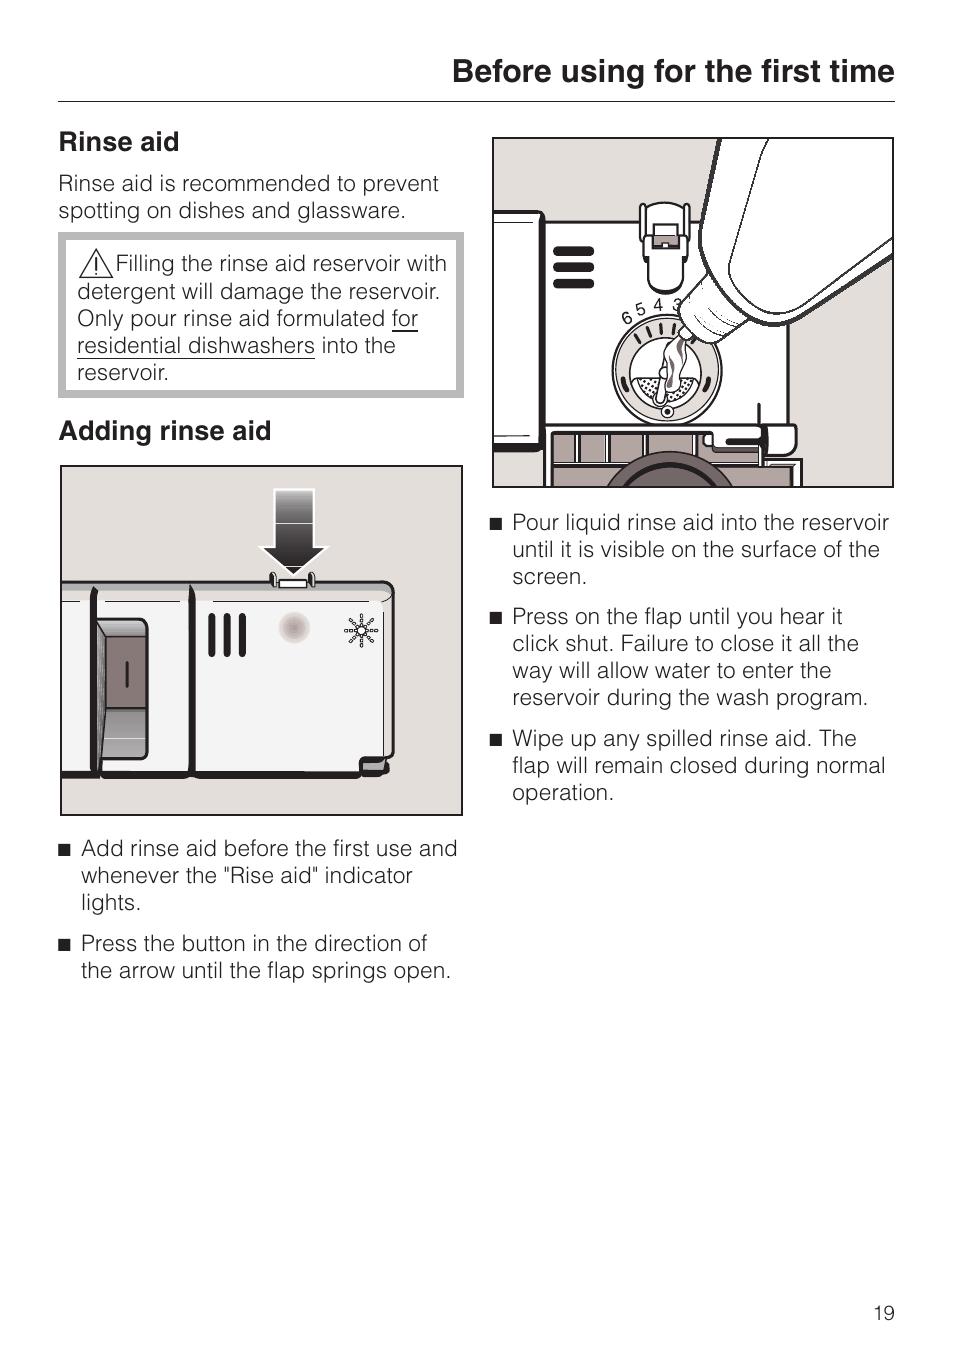 Rinse aid 19, Adding rinse aid 19, Rinse aid adding rinse